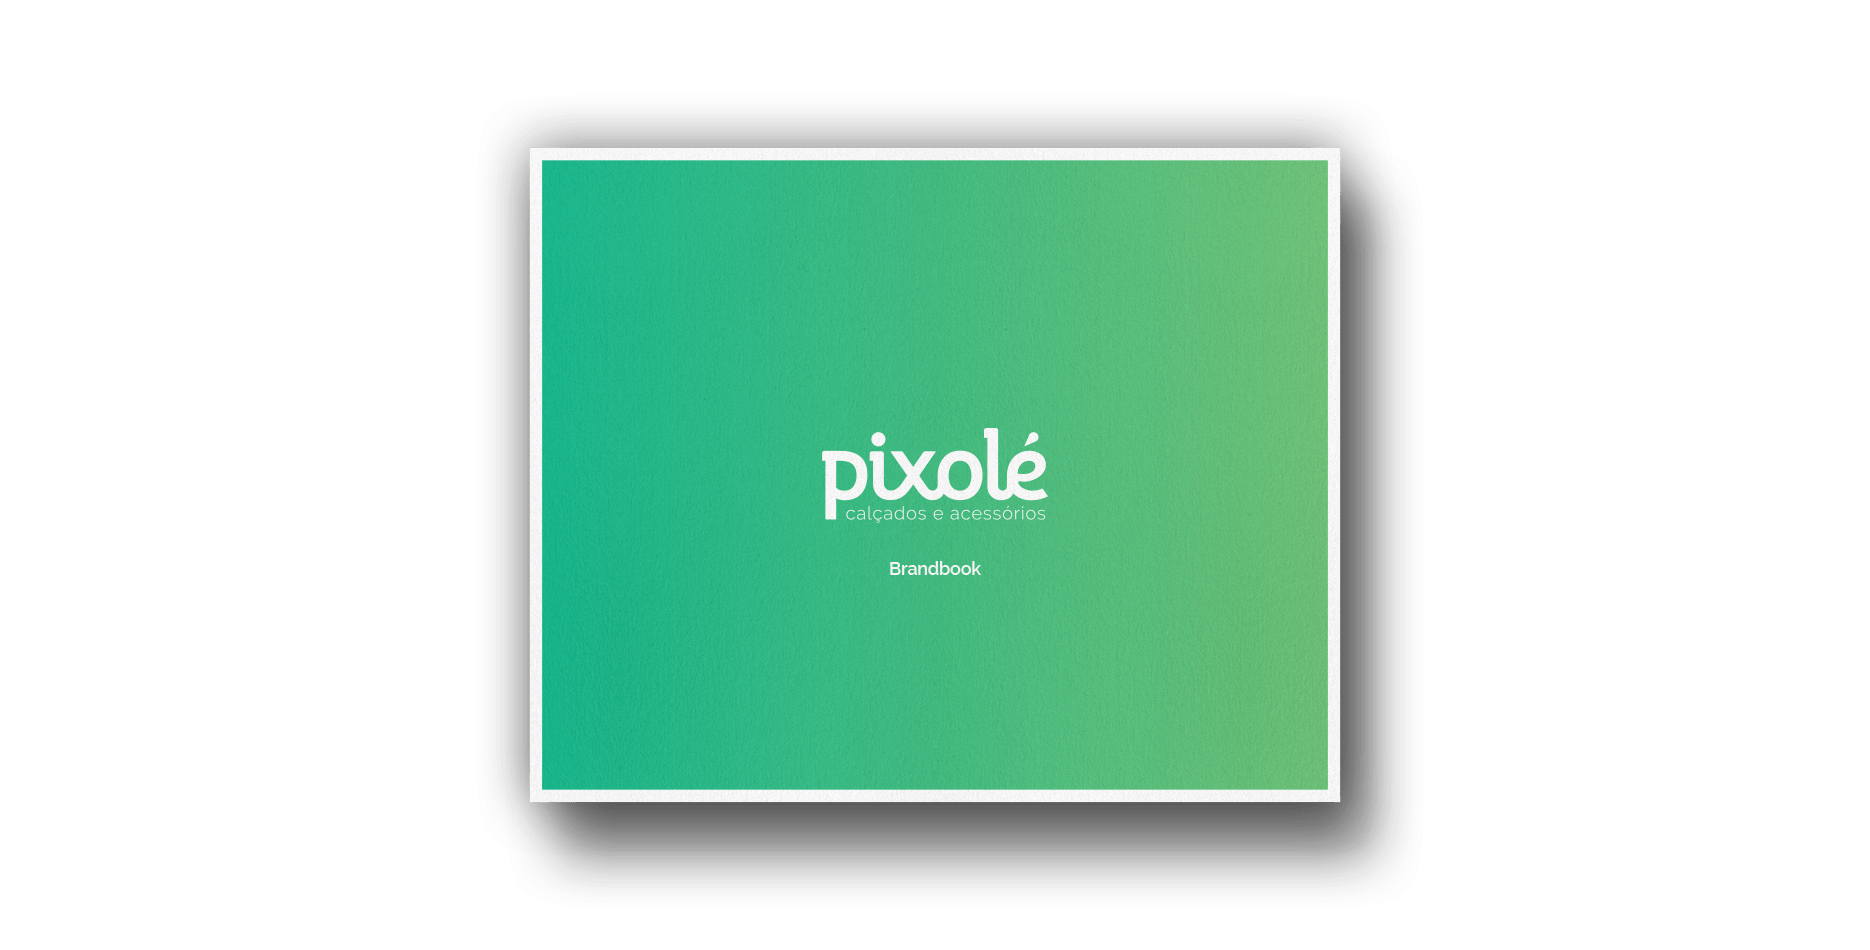 01-pixole-strategy-brandbook